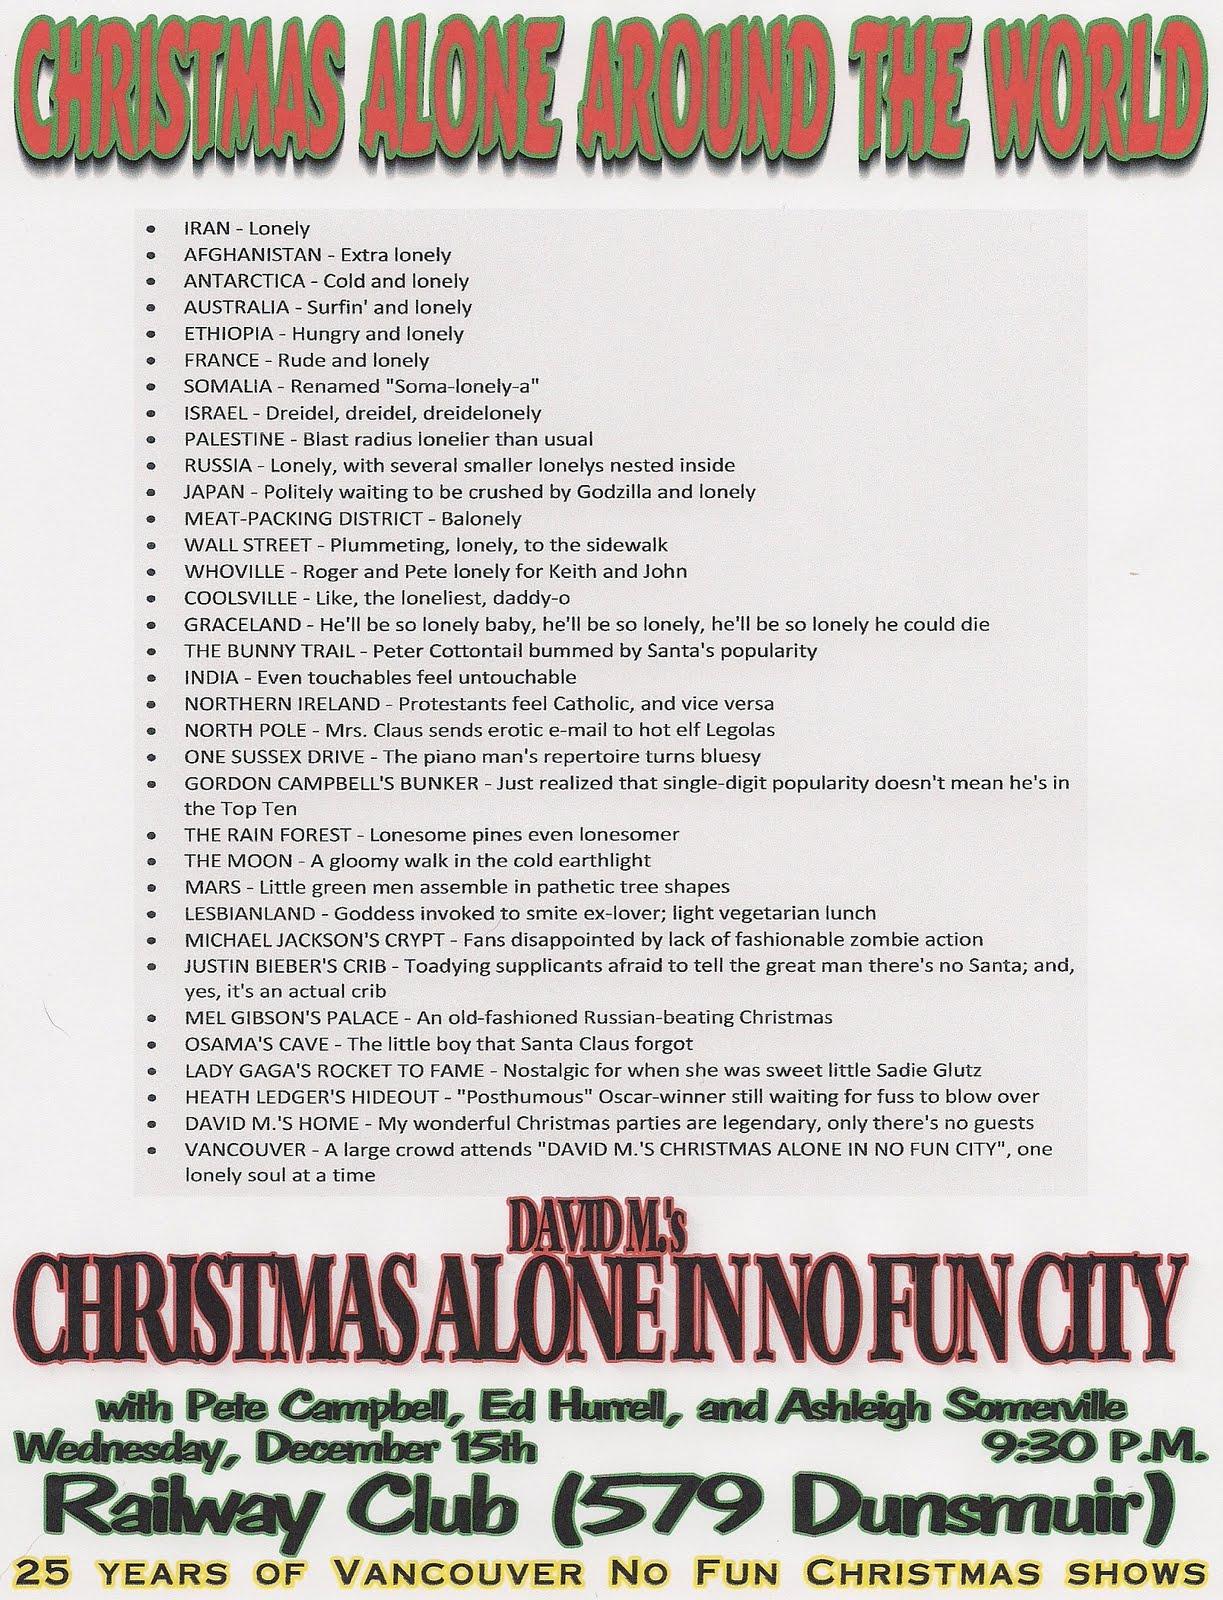 Alienated in Vancouver: David M\'s Christmas Alone in No Fun City!